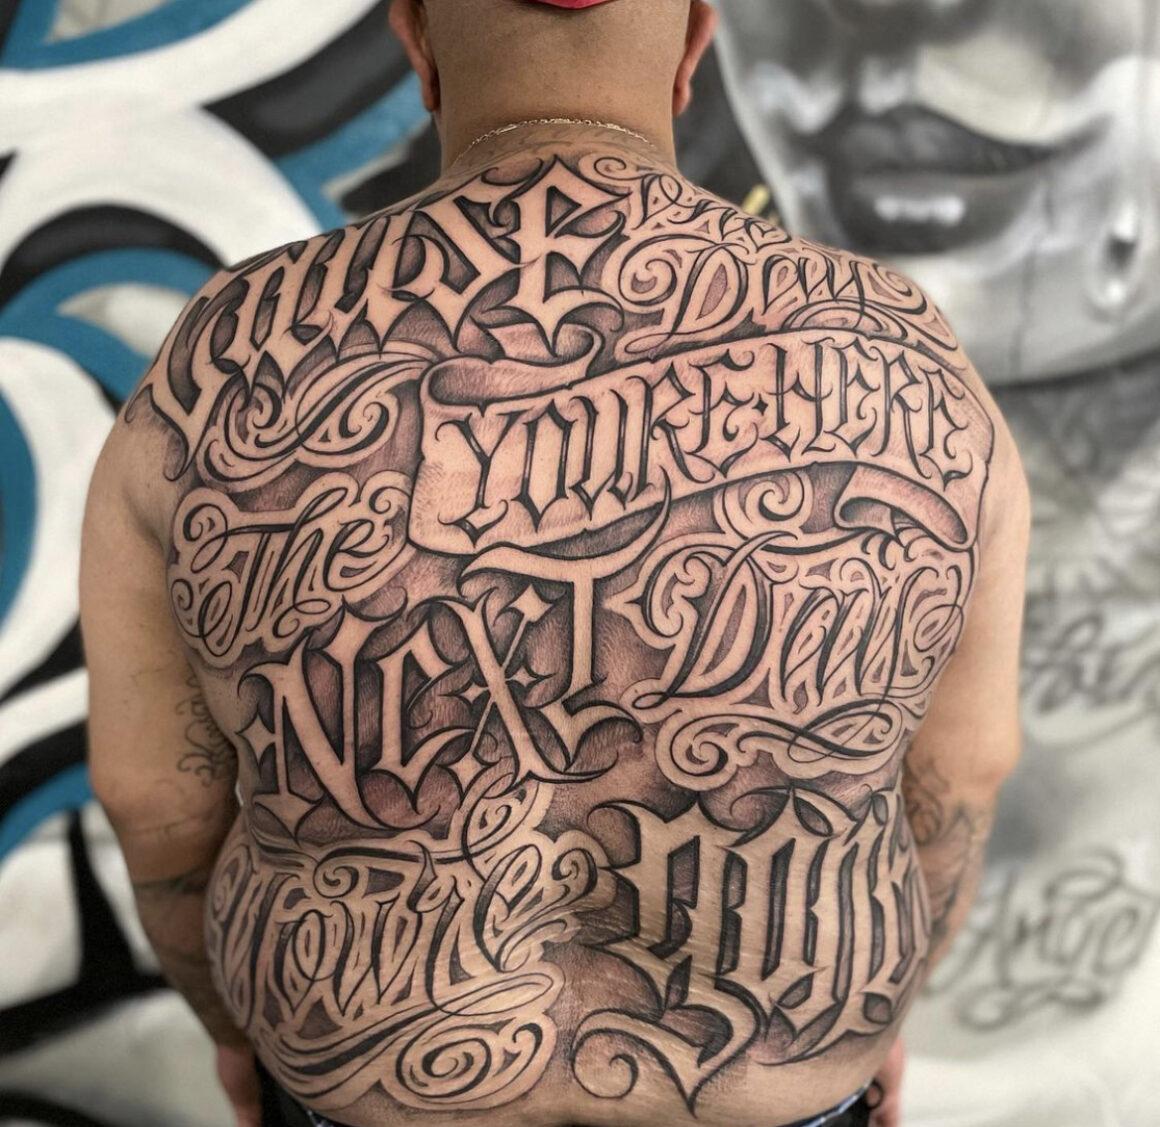 Case One, Left Coast Tattoo Studio, Palm Desert, USA